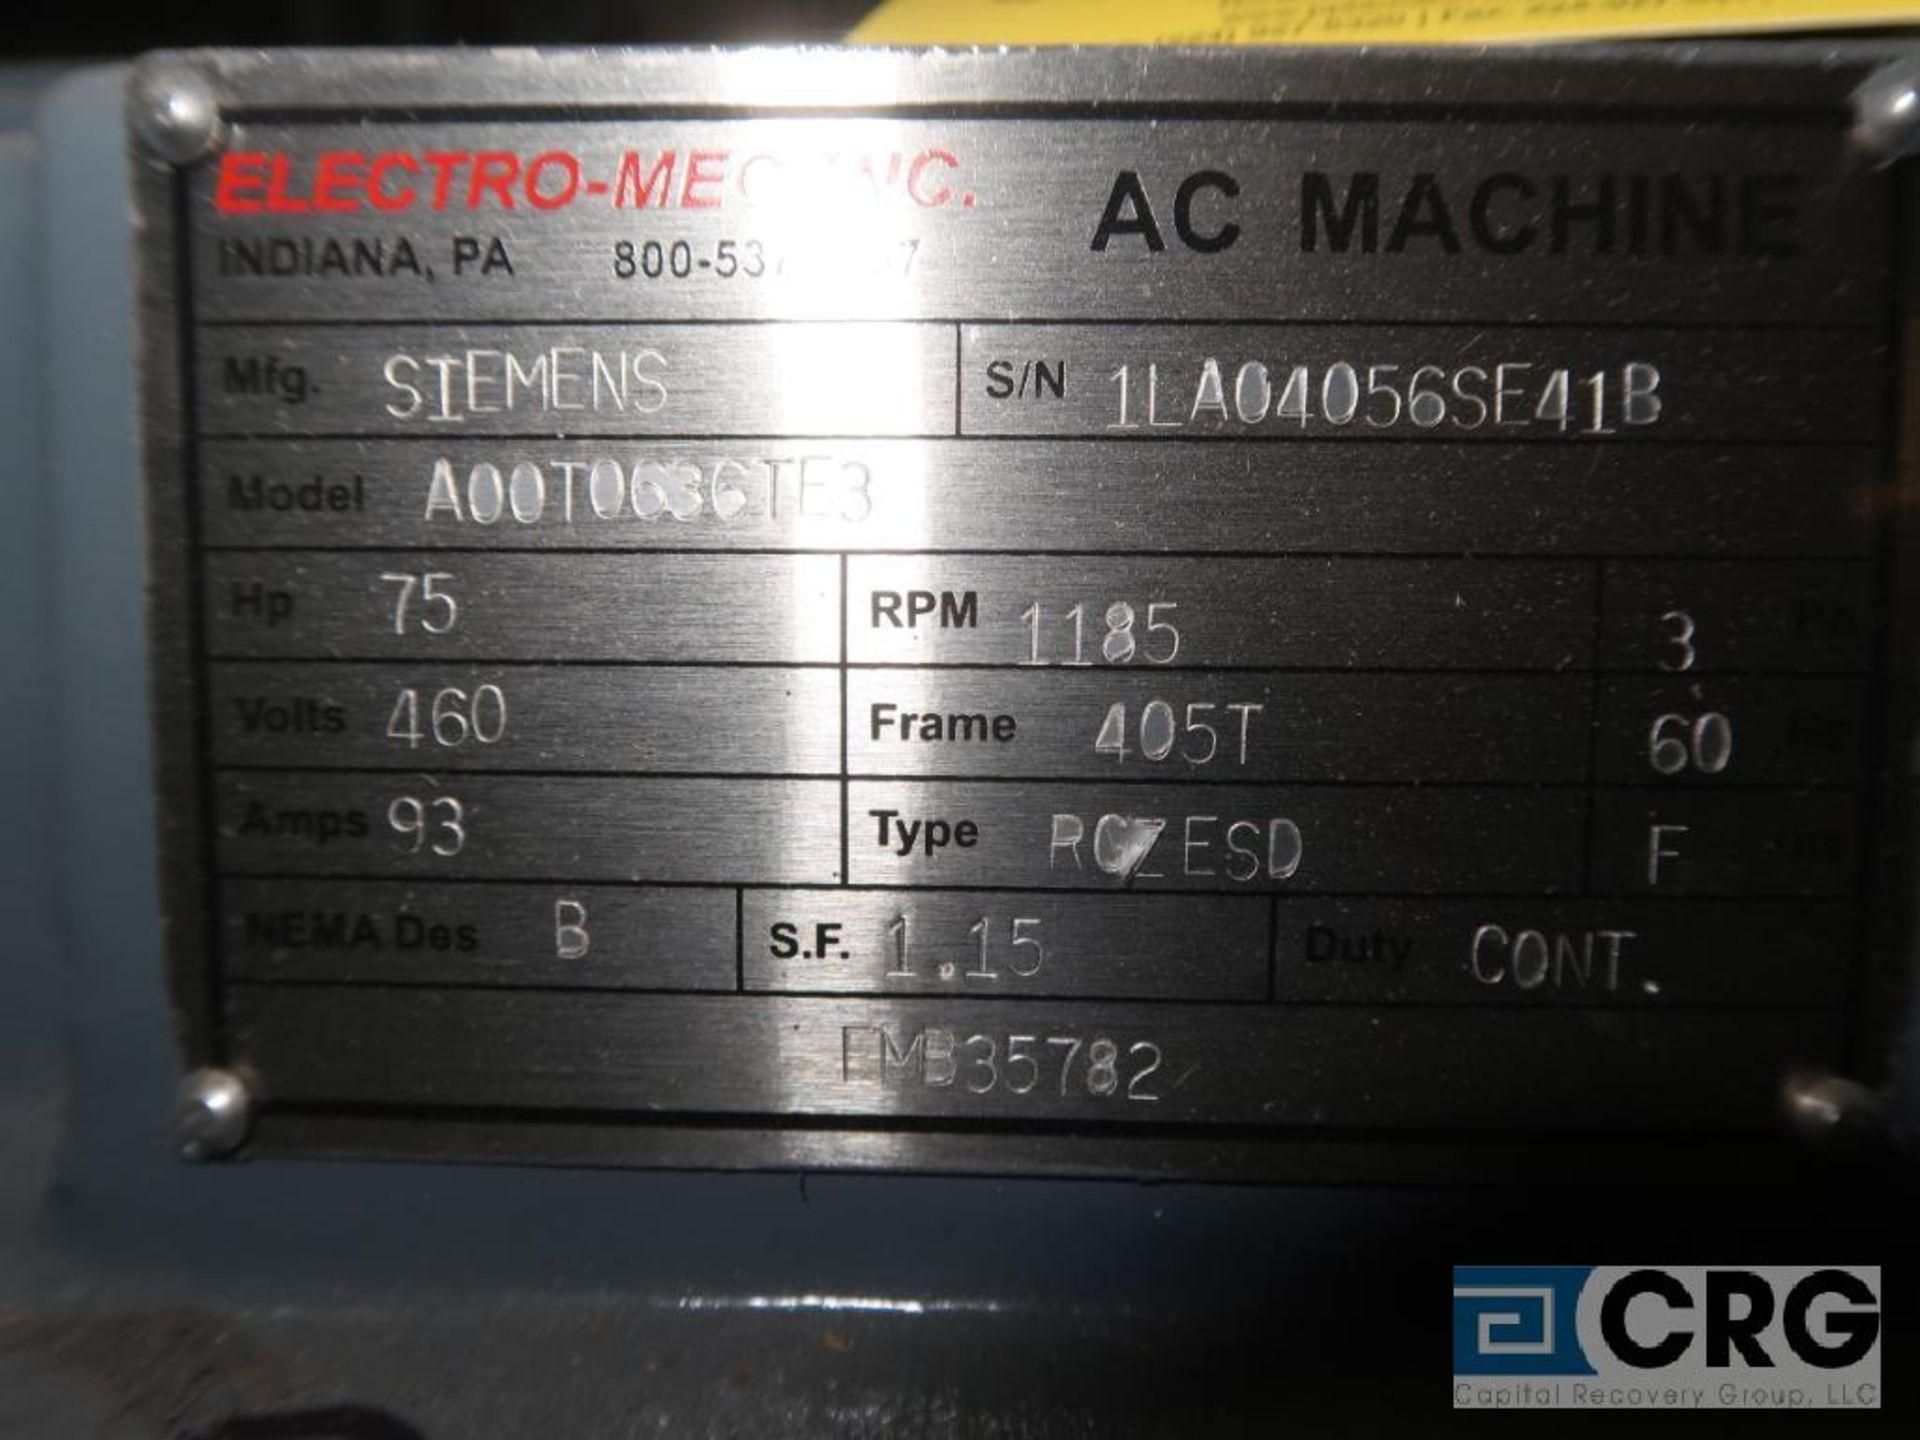 Siemens AC Machine motor, 75 HP, 1,185 RPMs, 460 volt, 3 ph., 405T frame (Finish Building) - Image 2 of 2